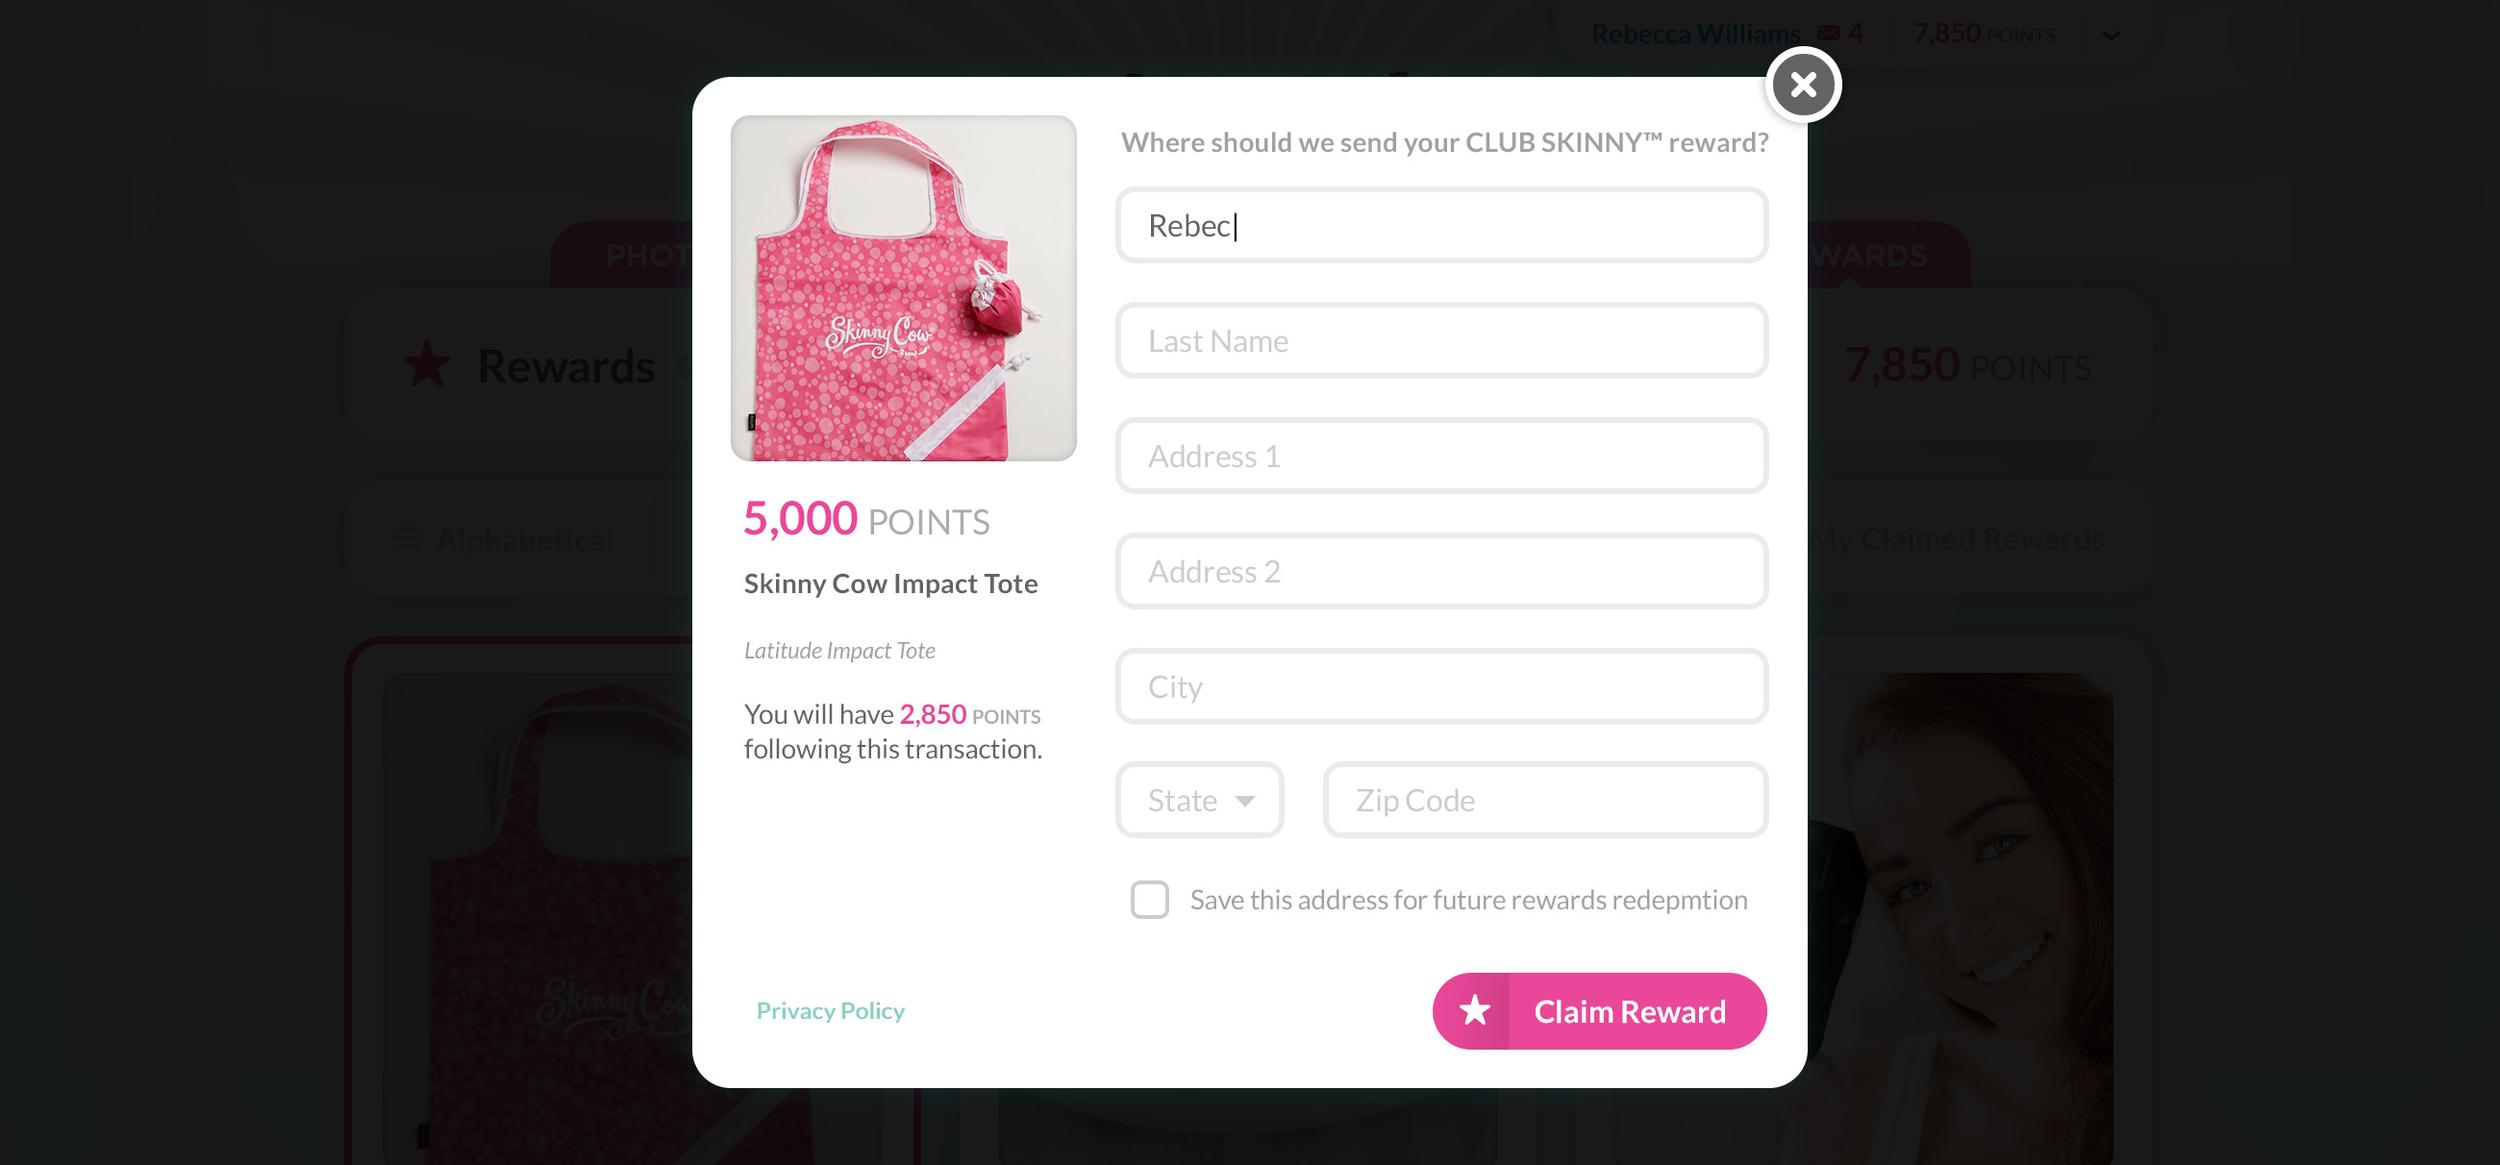 web-reward-redeem@2x.jpg